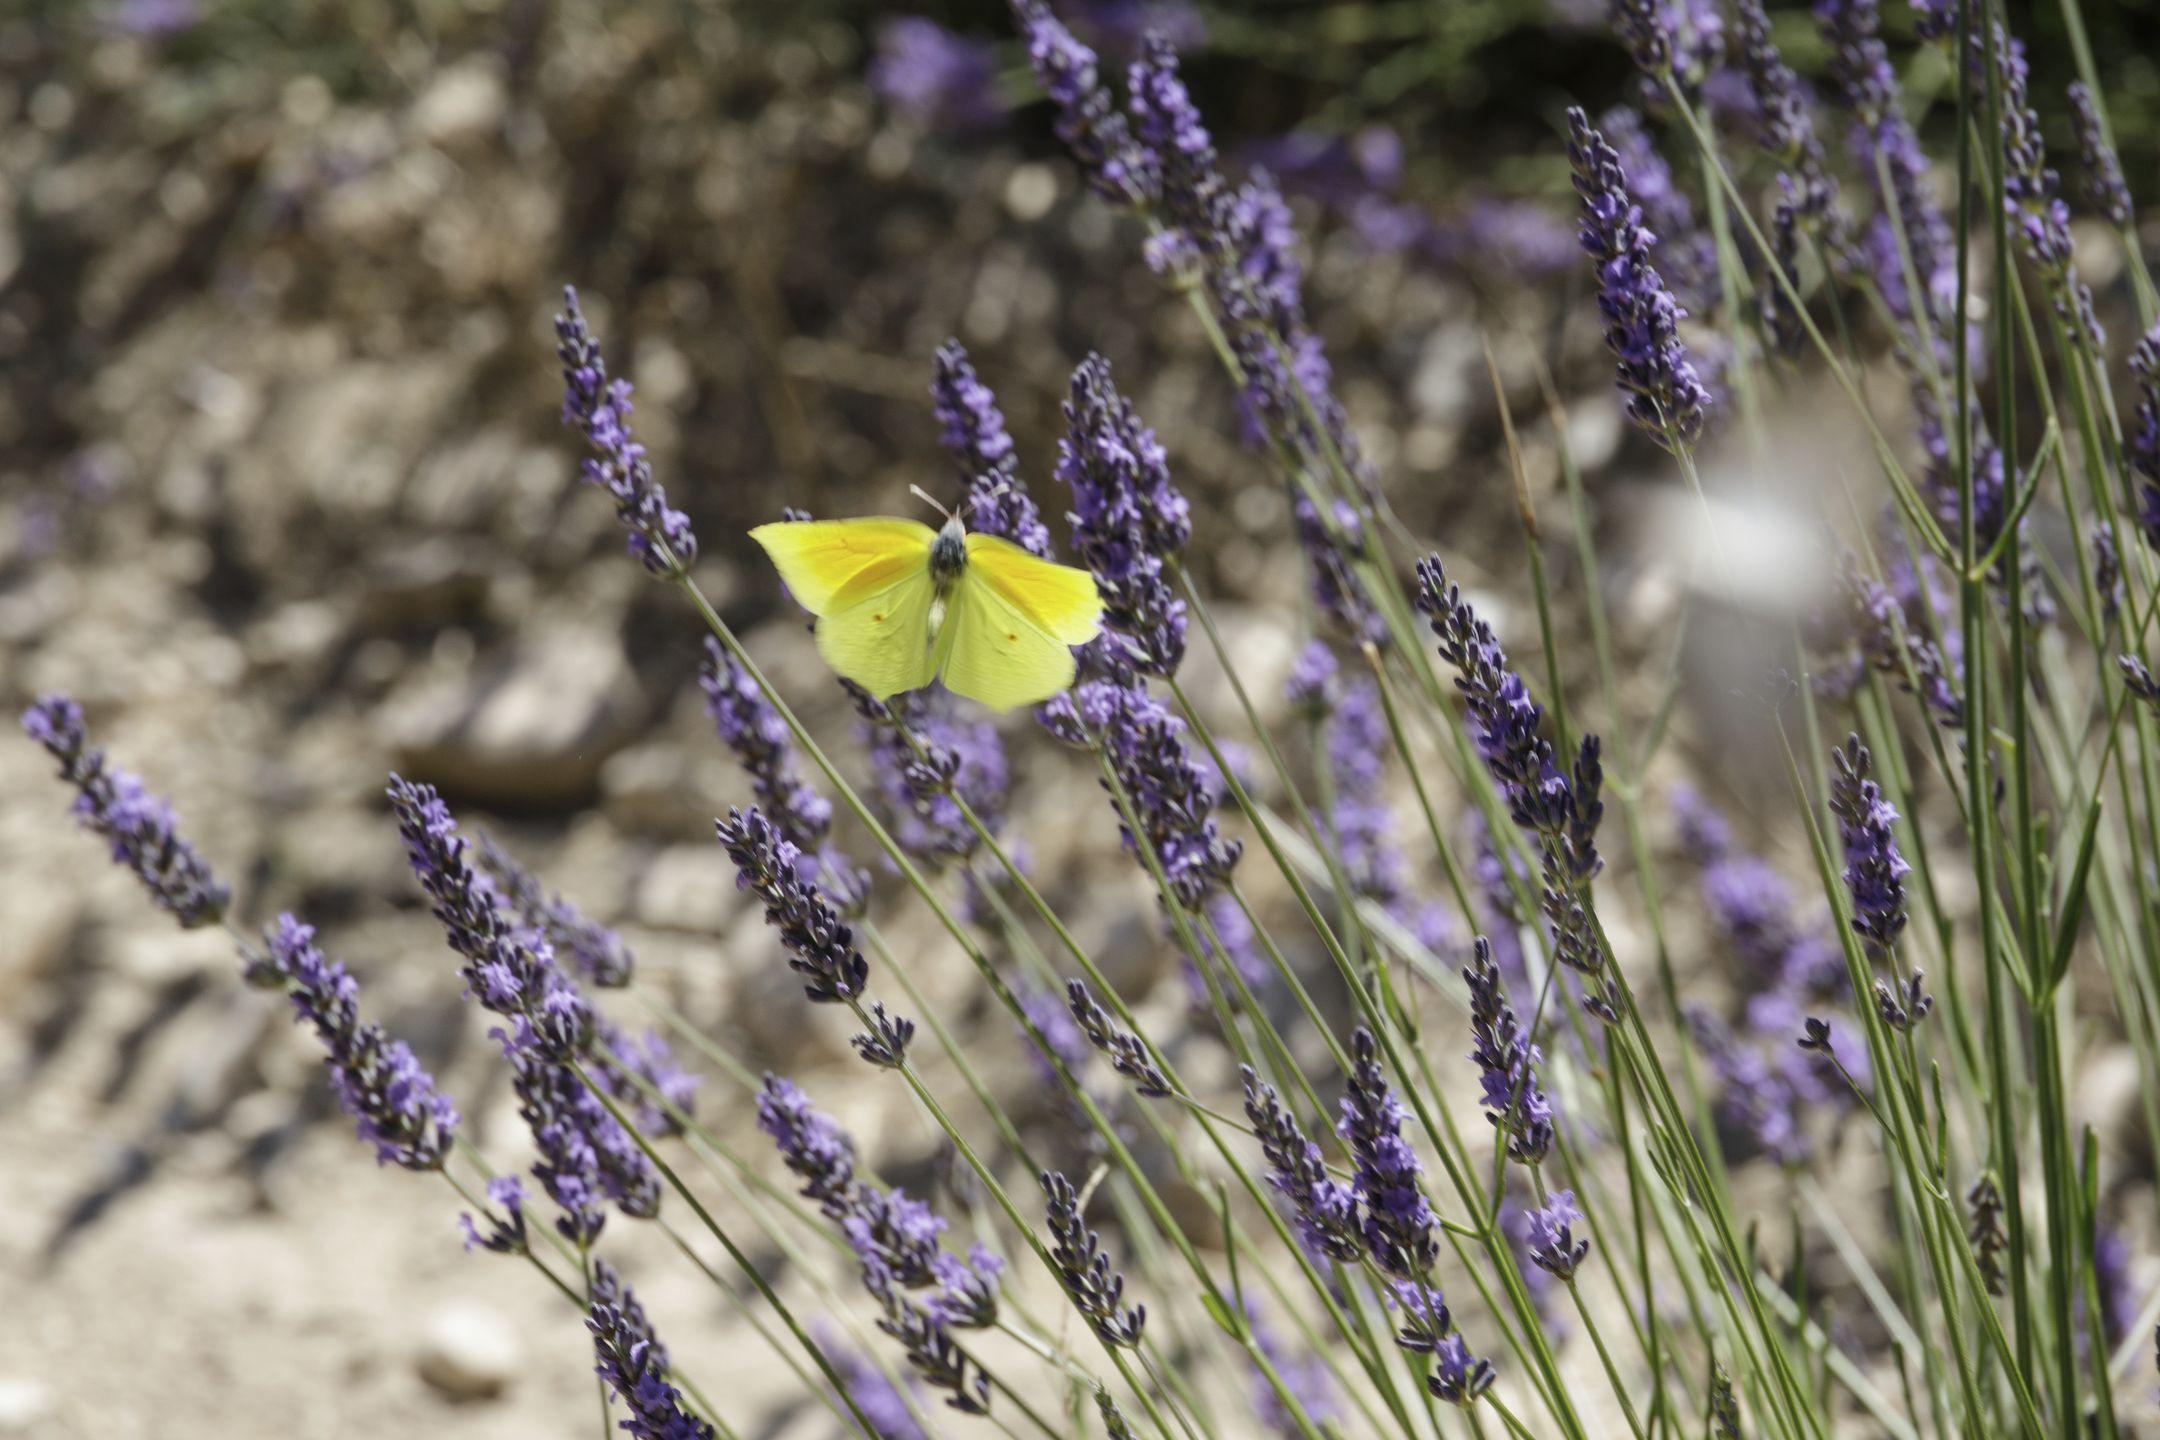 20210629-Provence-11-36-17-042